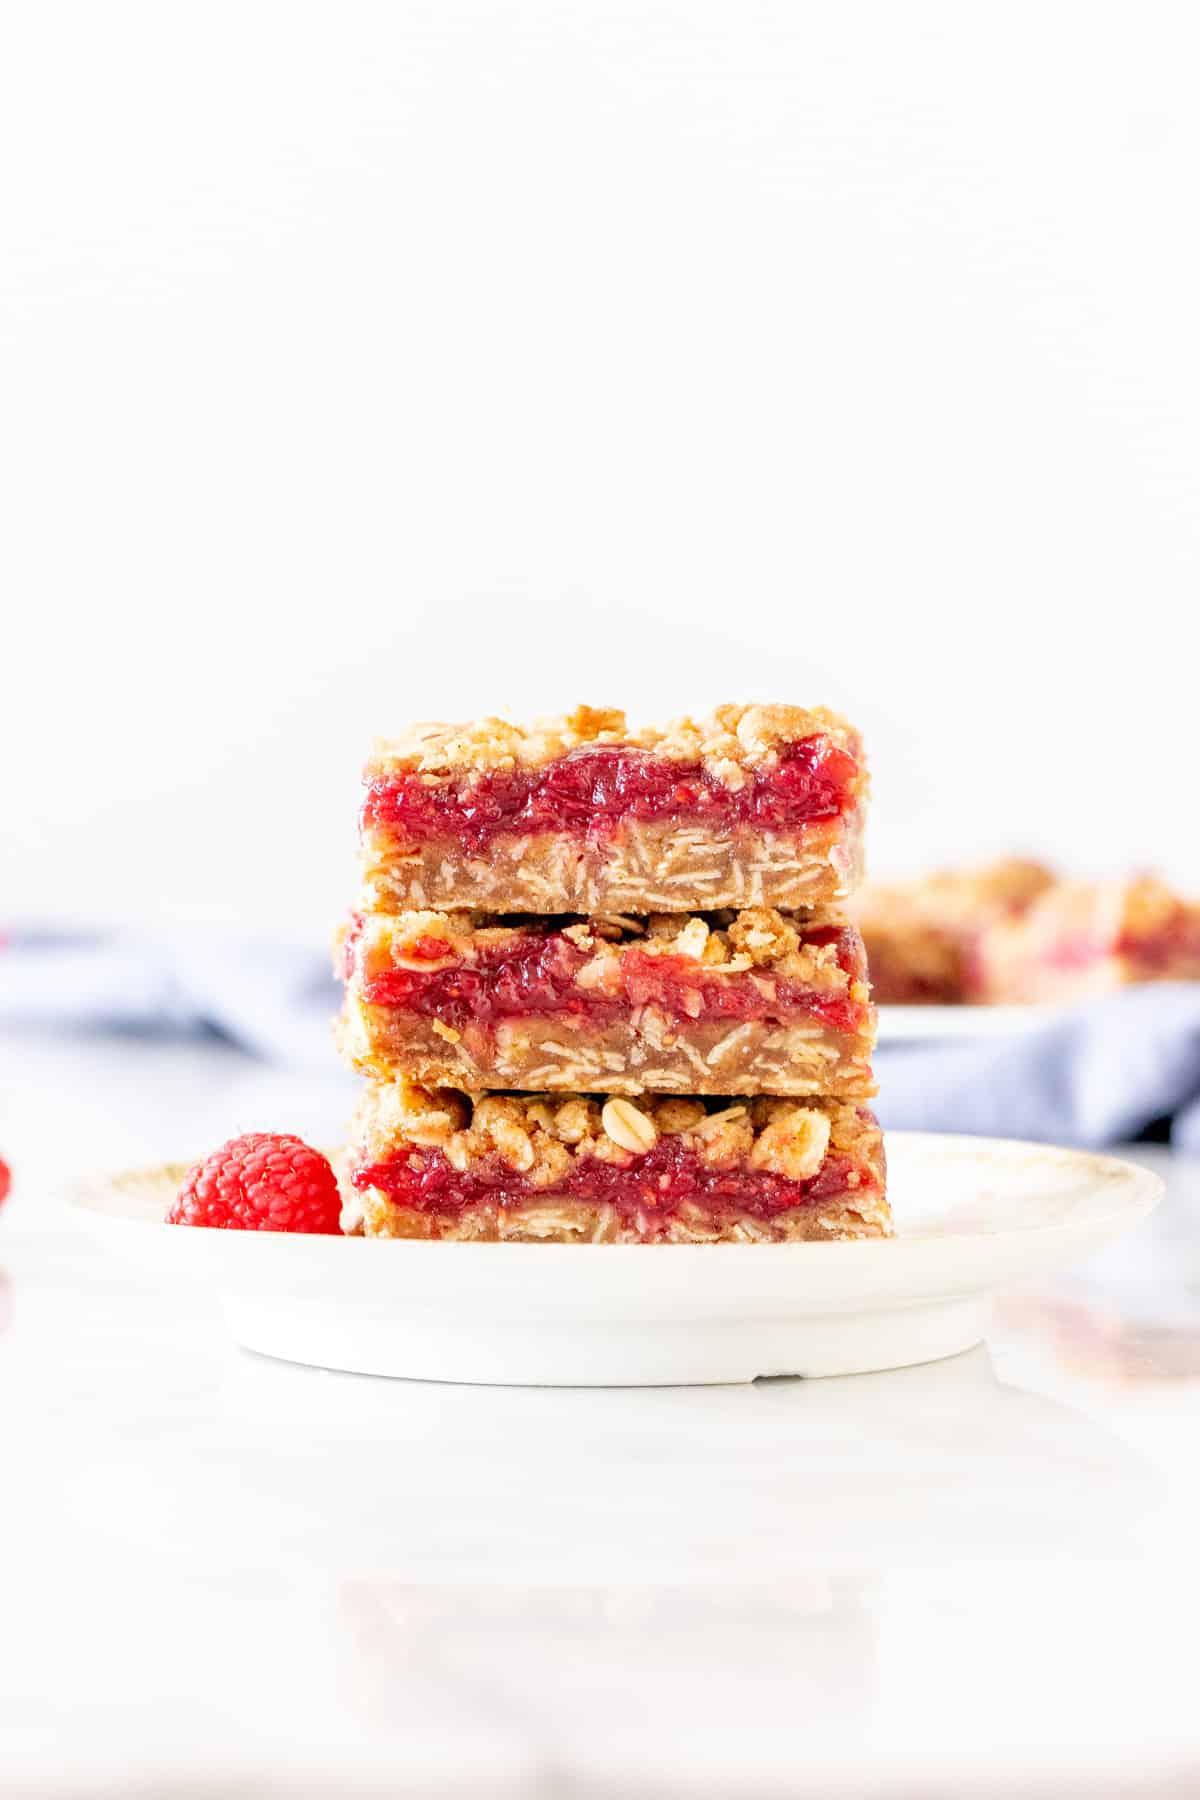 Stack of 3 raspberry crumble bars